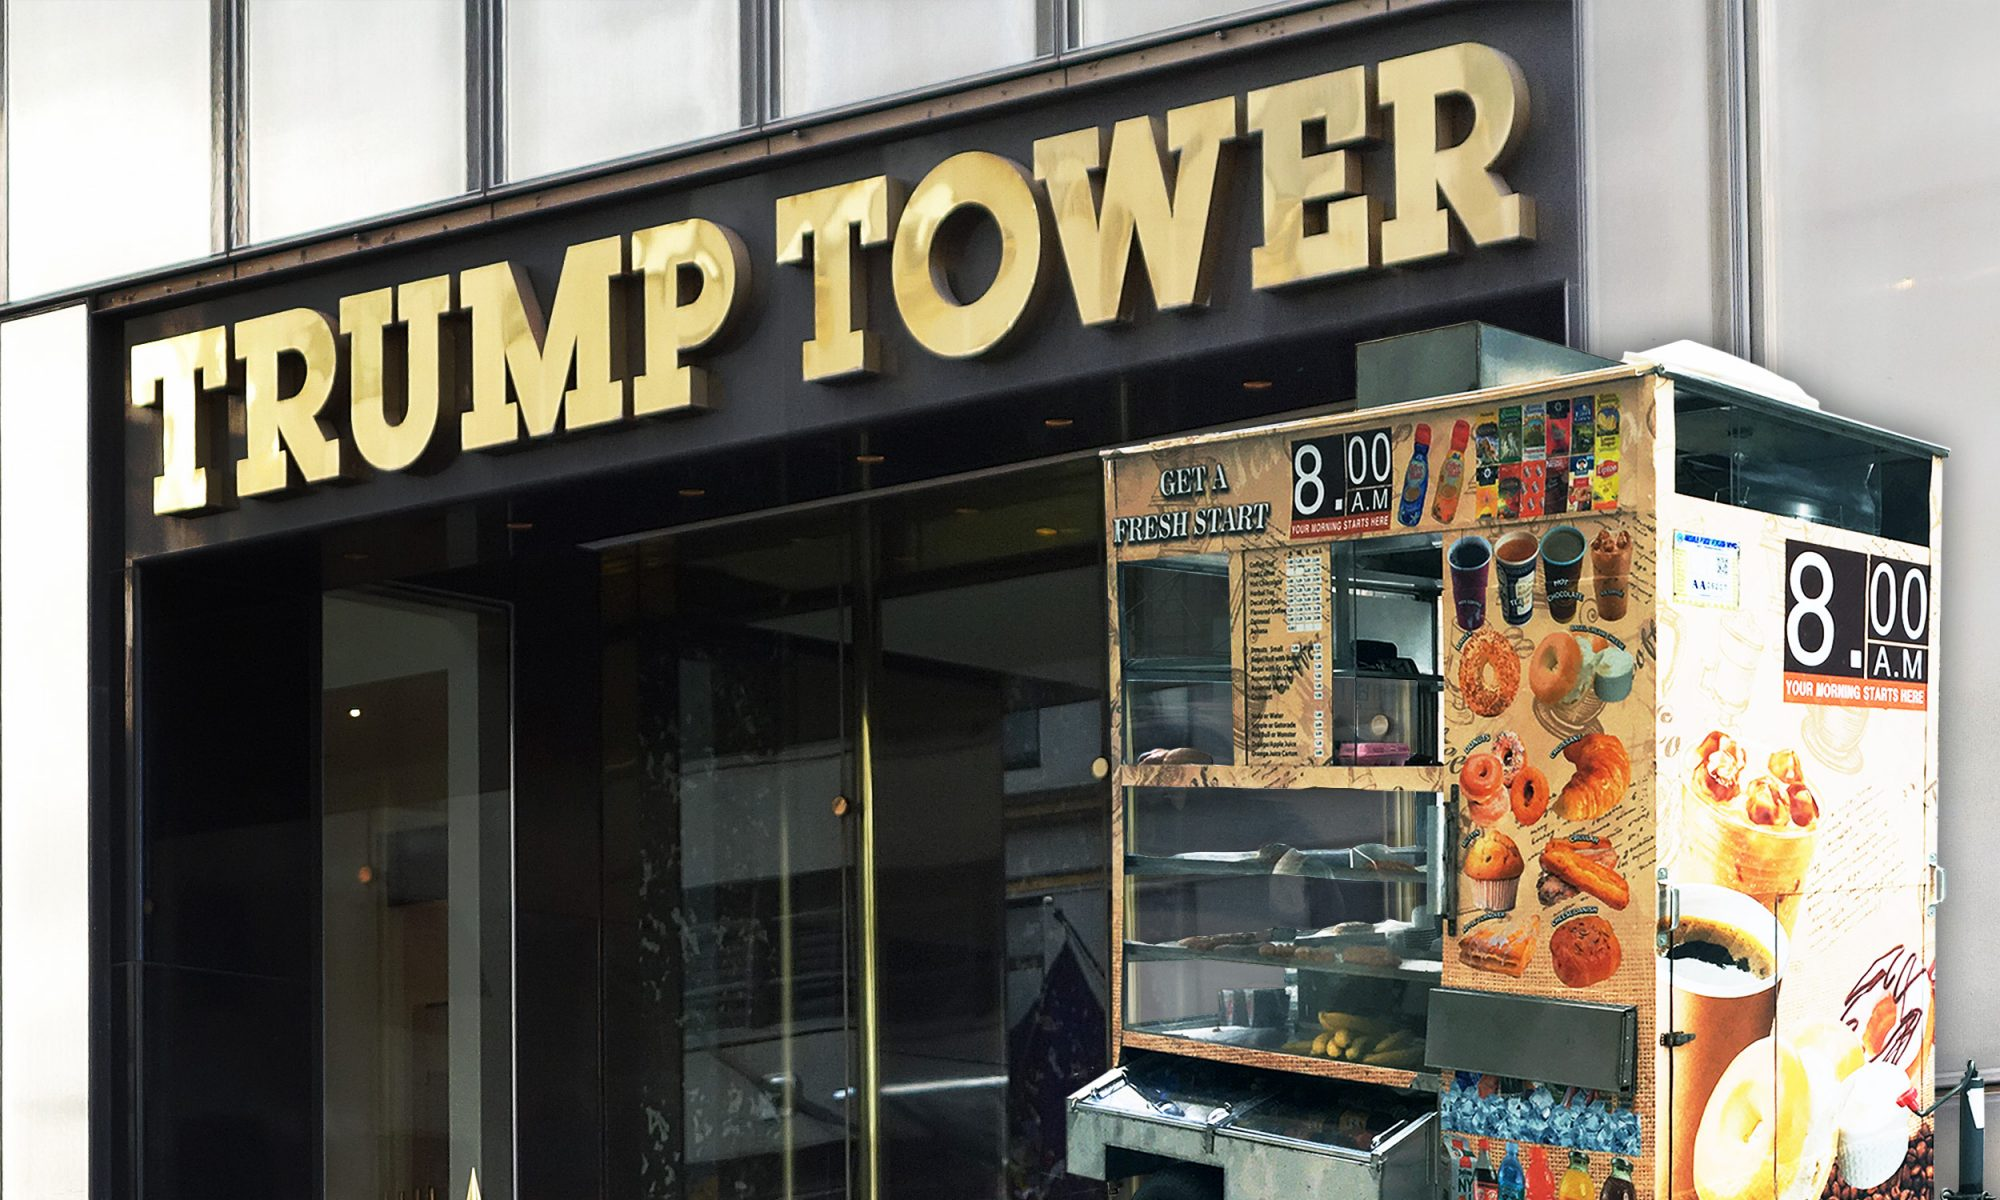 Trump tower food carts